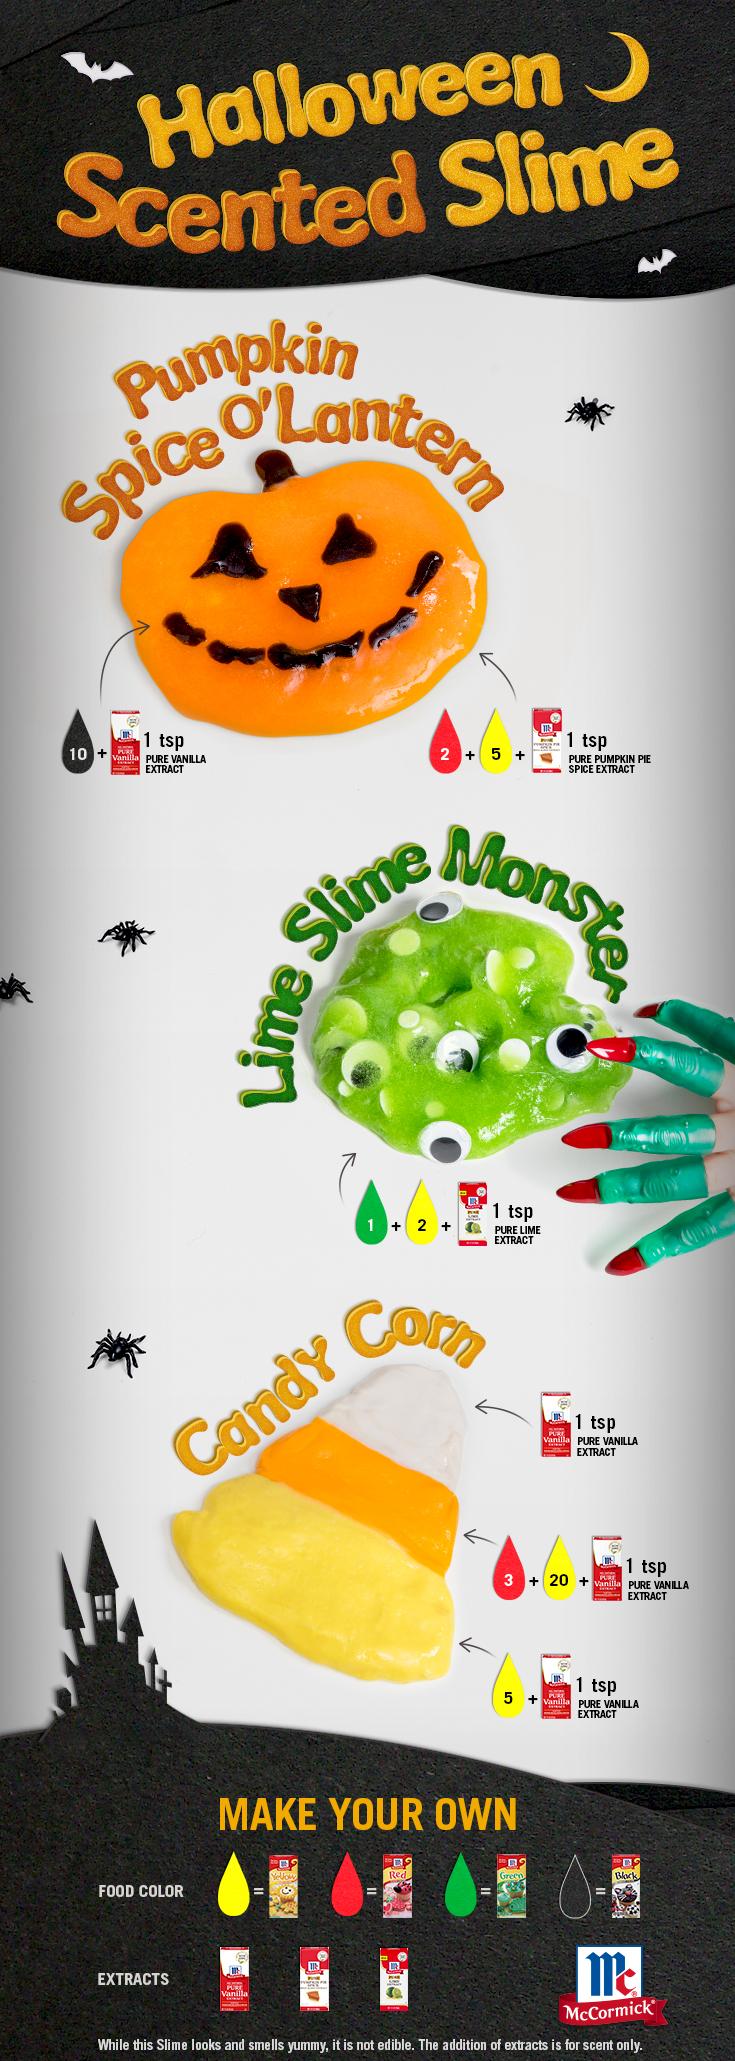 McCormick_SlimeInfographics_Halloween_Design-Social_03a_tvw.jpg